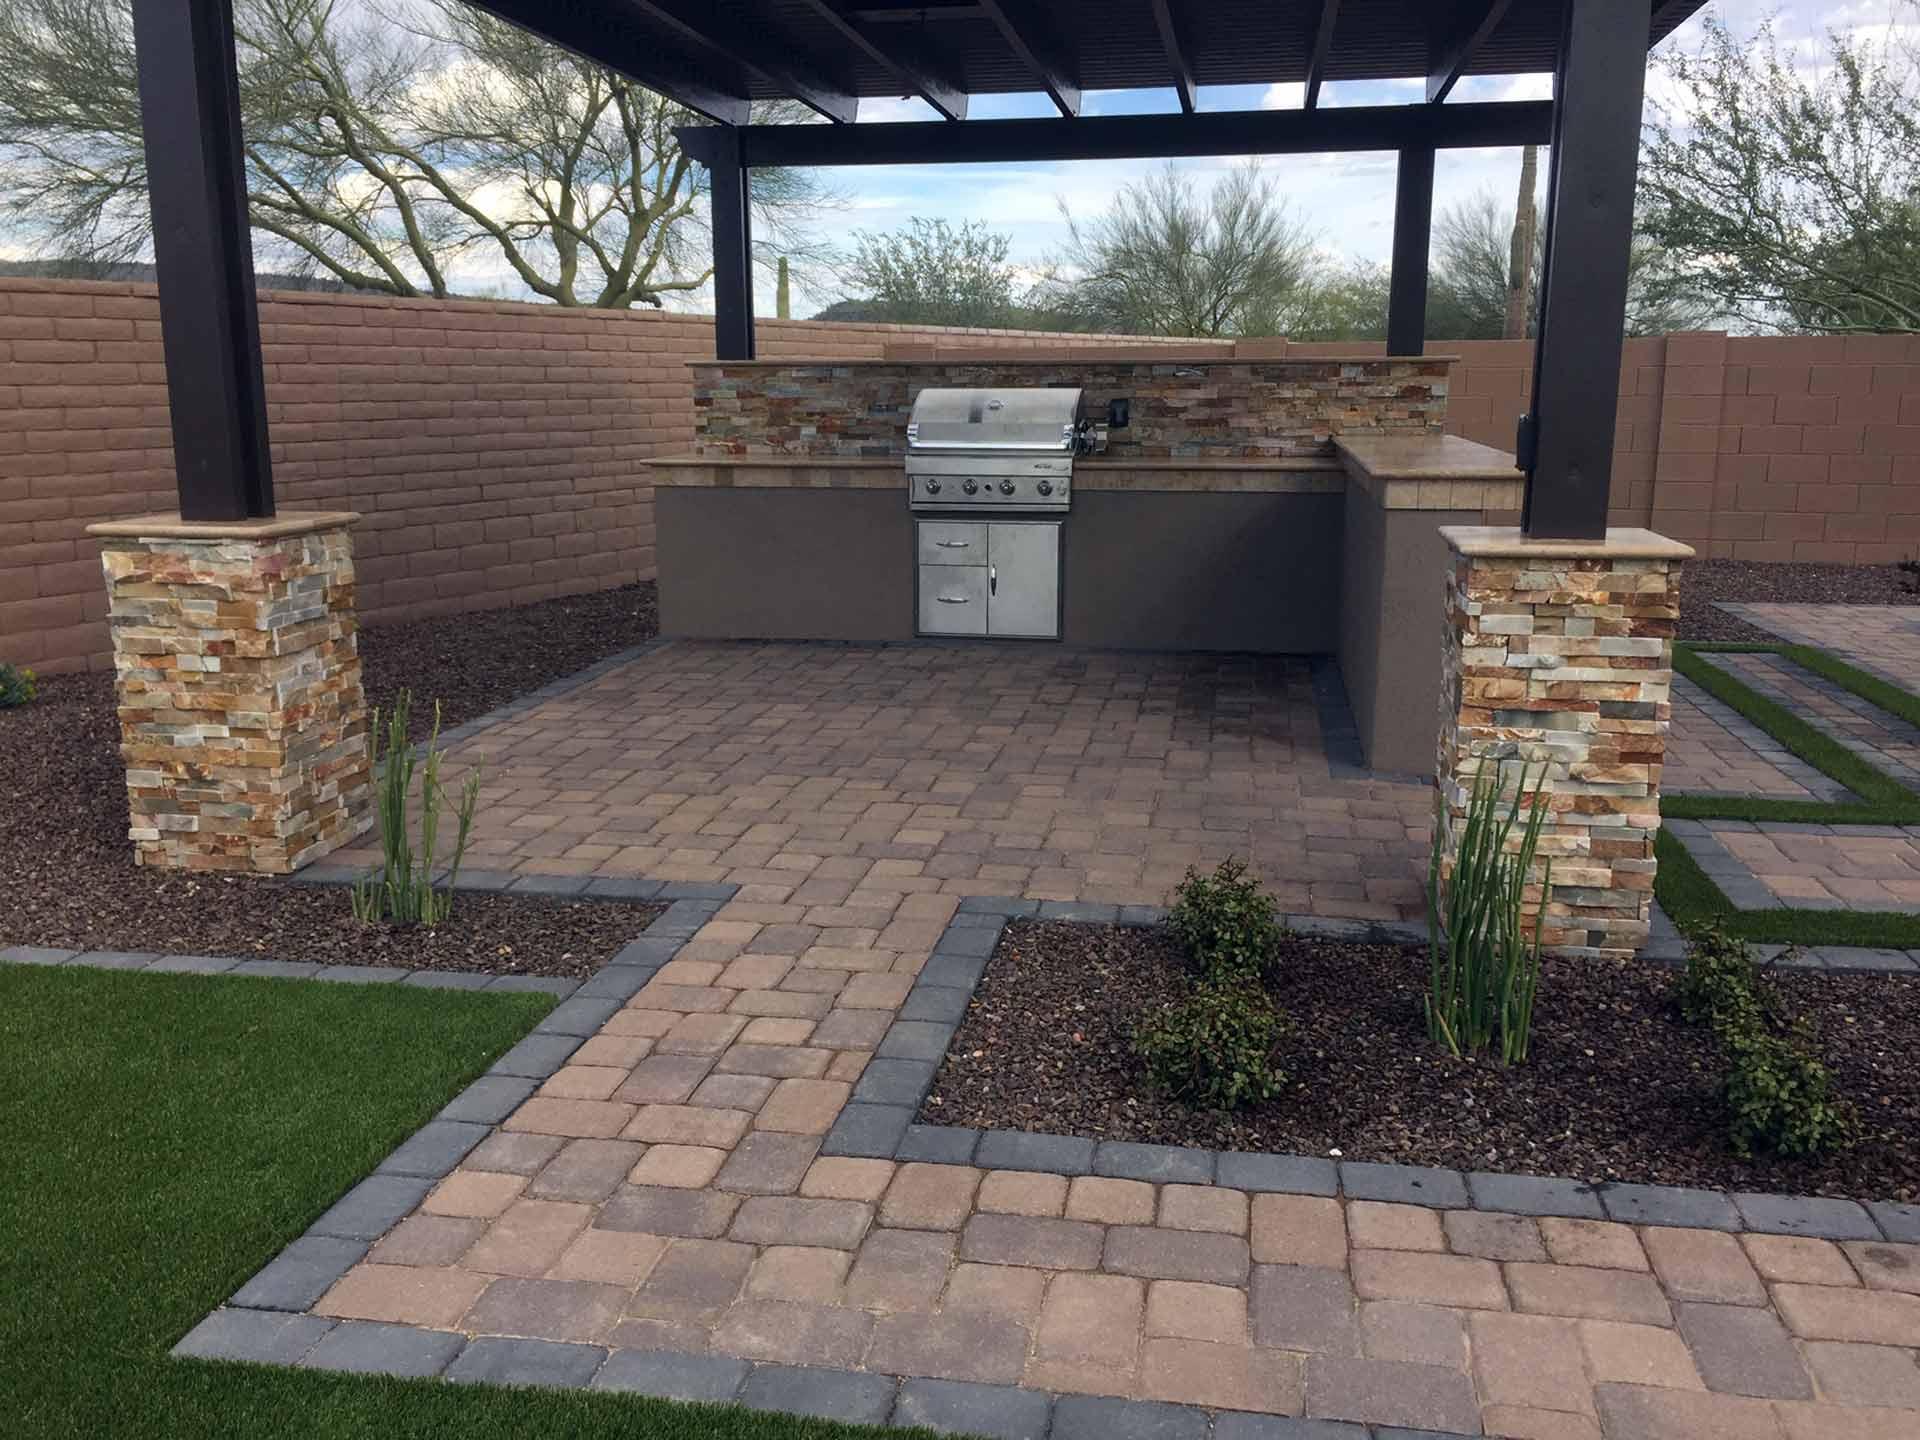 greenstar-eco-outdoor-kitchens-slider-8